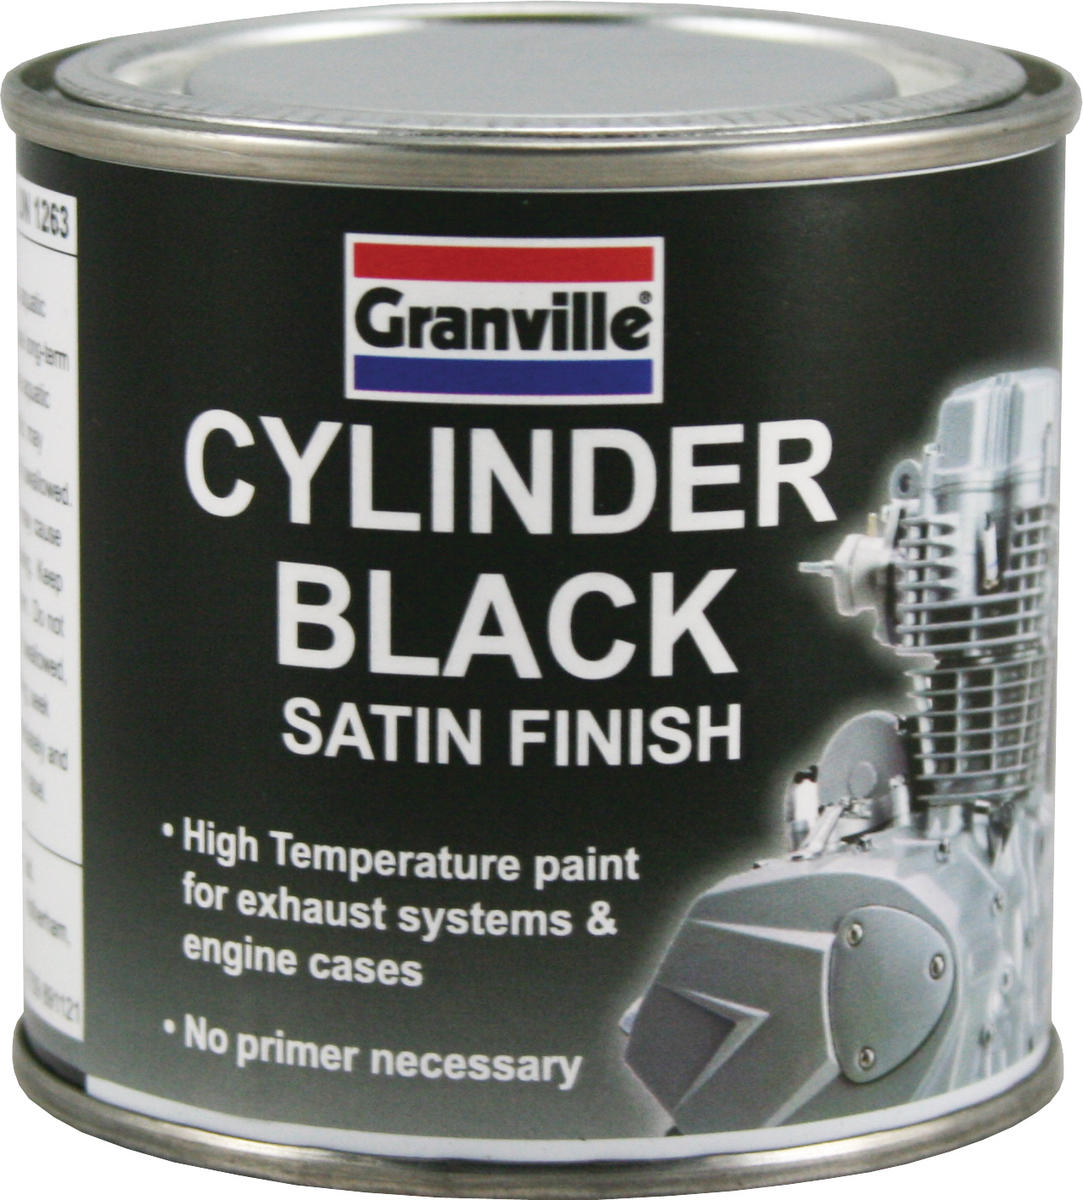 GRANVILLE 0246 Black Satin Cylinder Brush On Paint 100ml